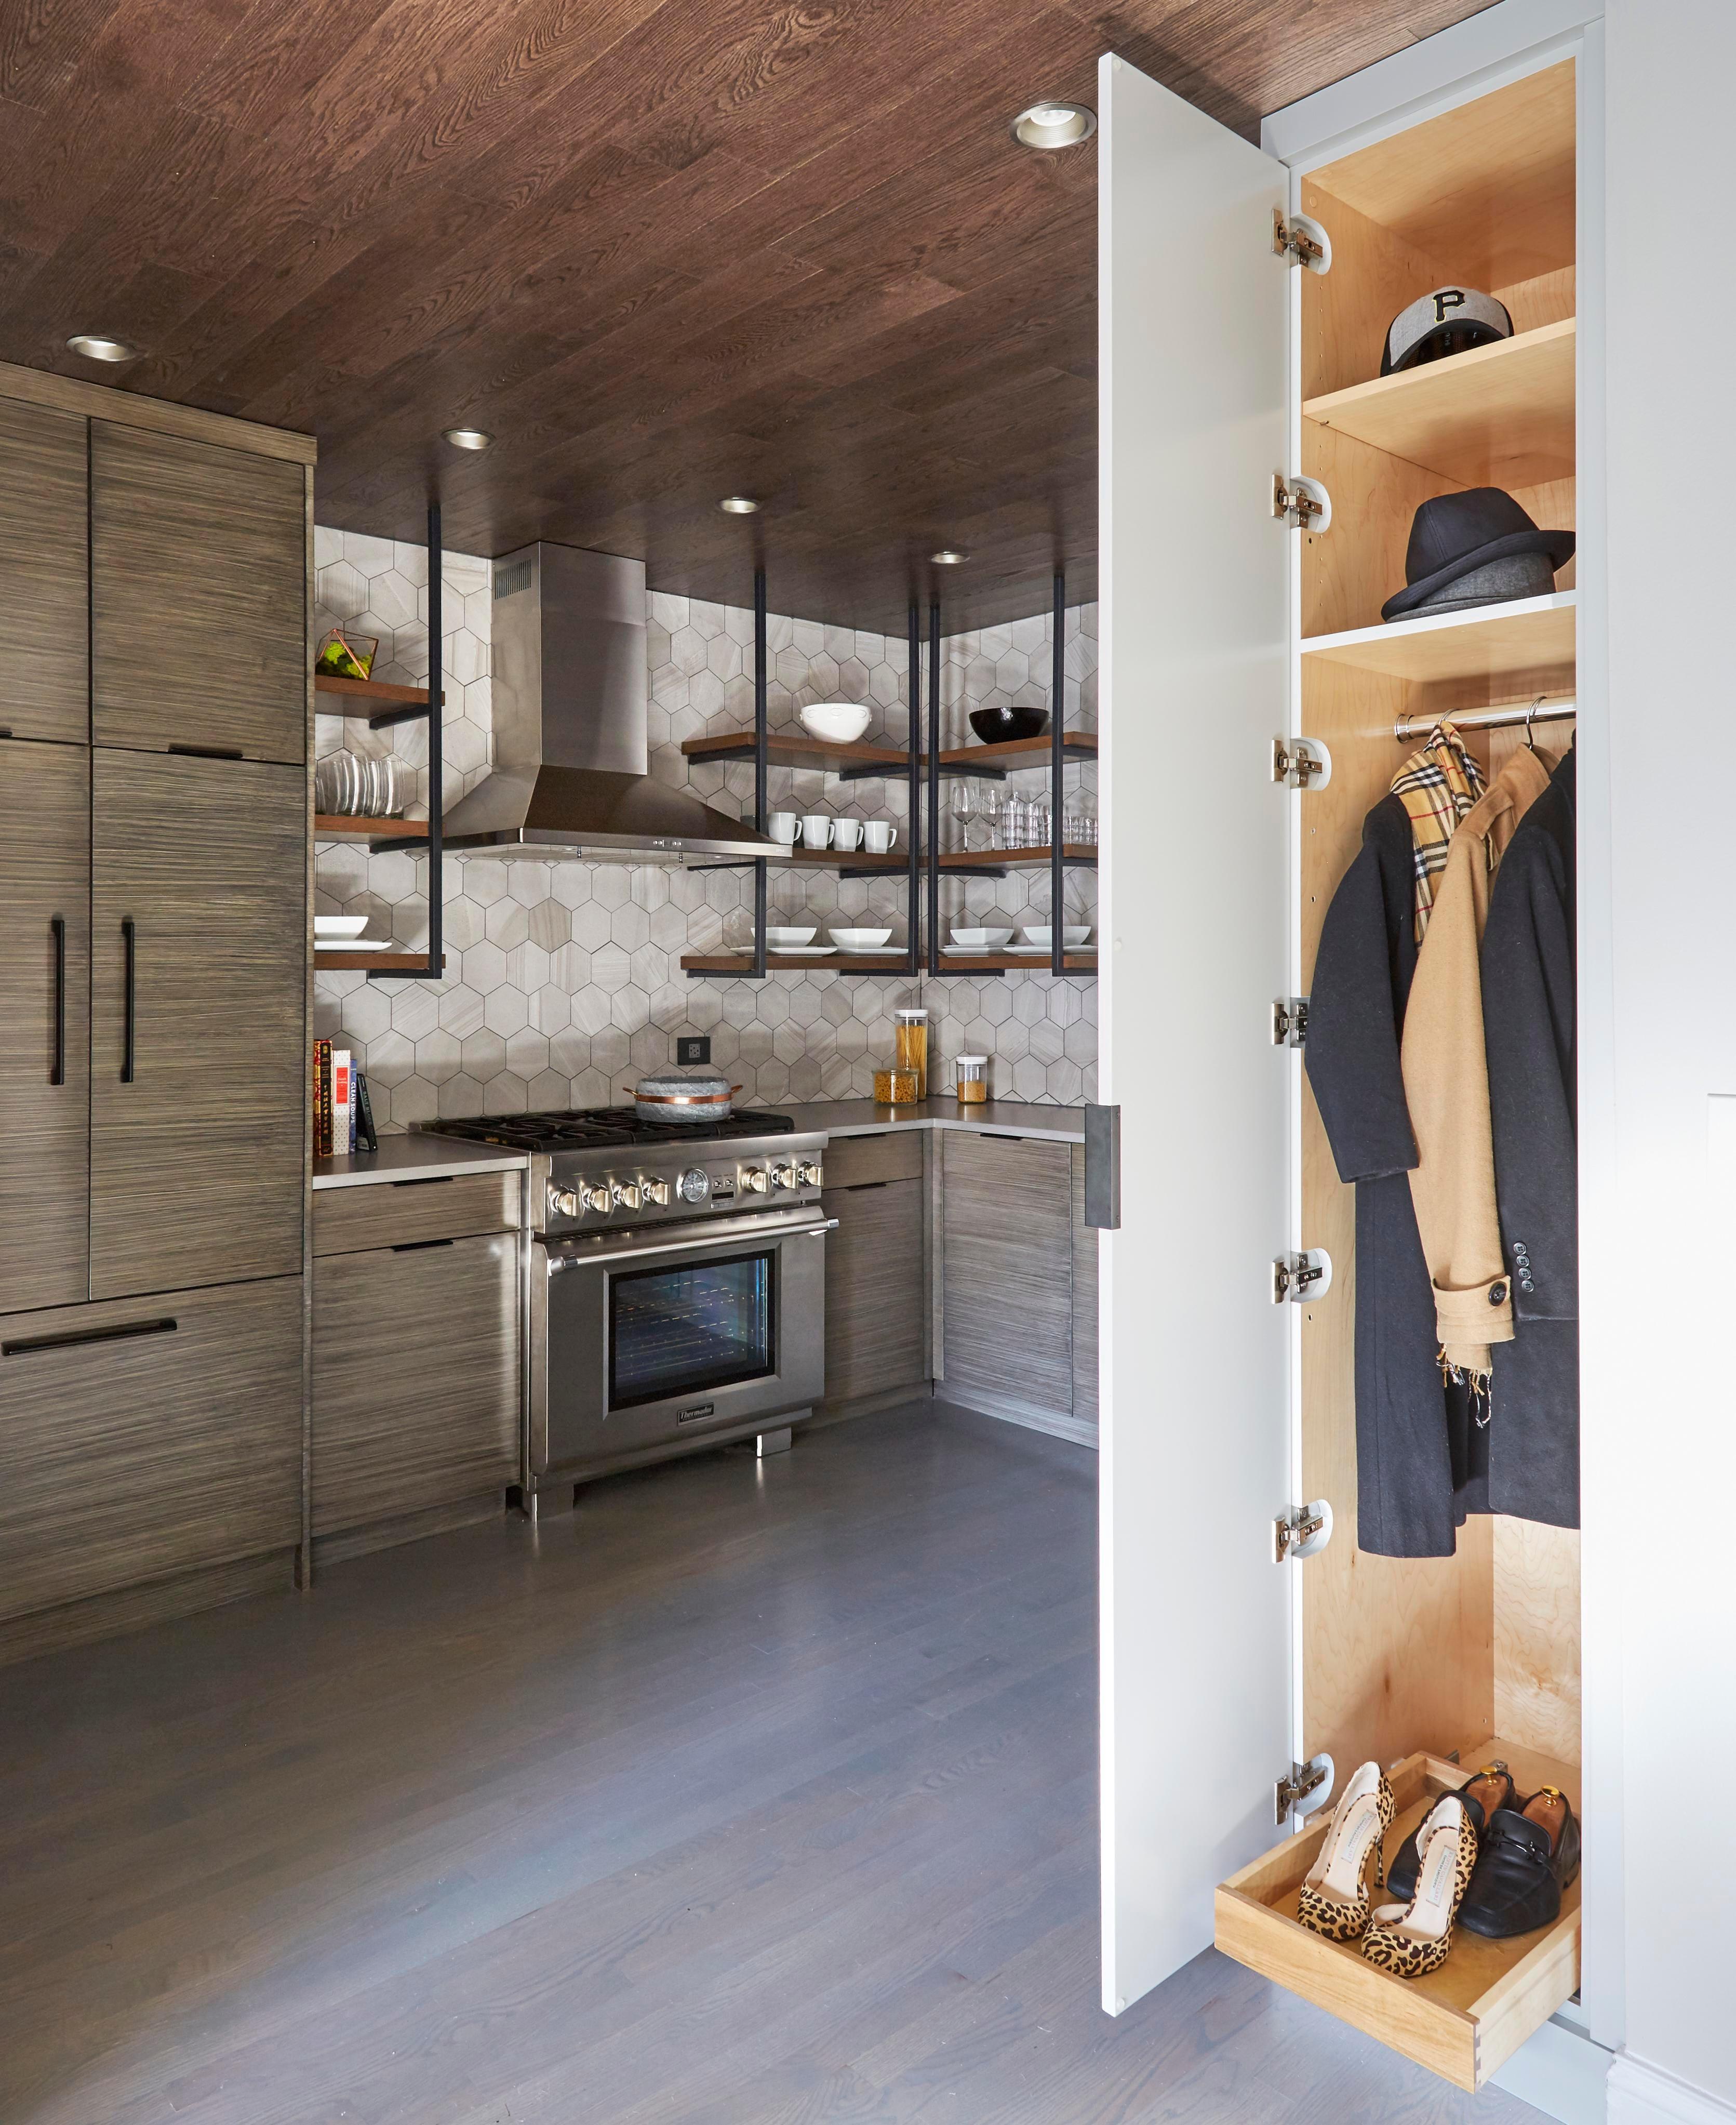 Lincoln Park Condo Kitchen Kitchen Butleru0027s Pantry Closet Architectural  Detail Contemporary Industrial ...